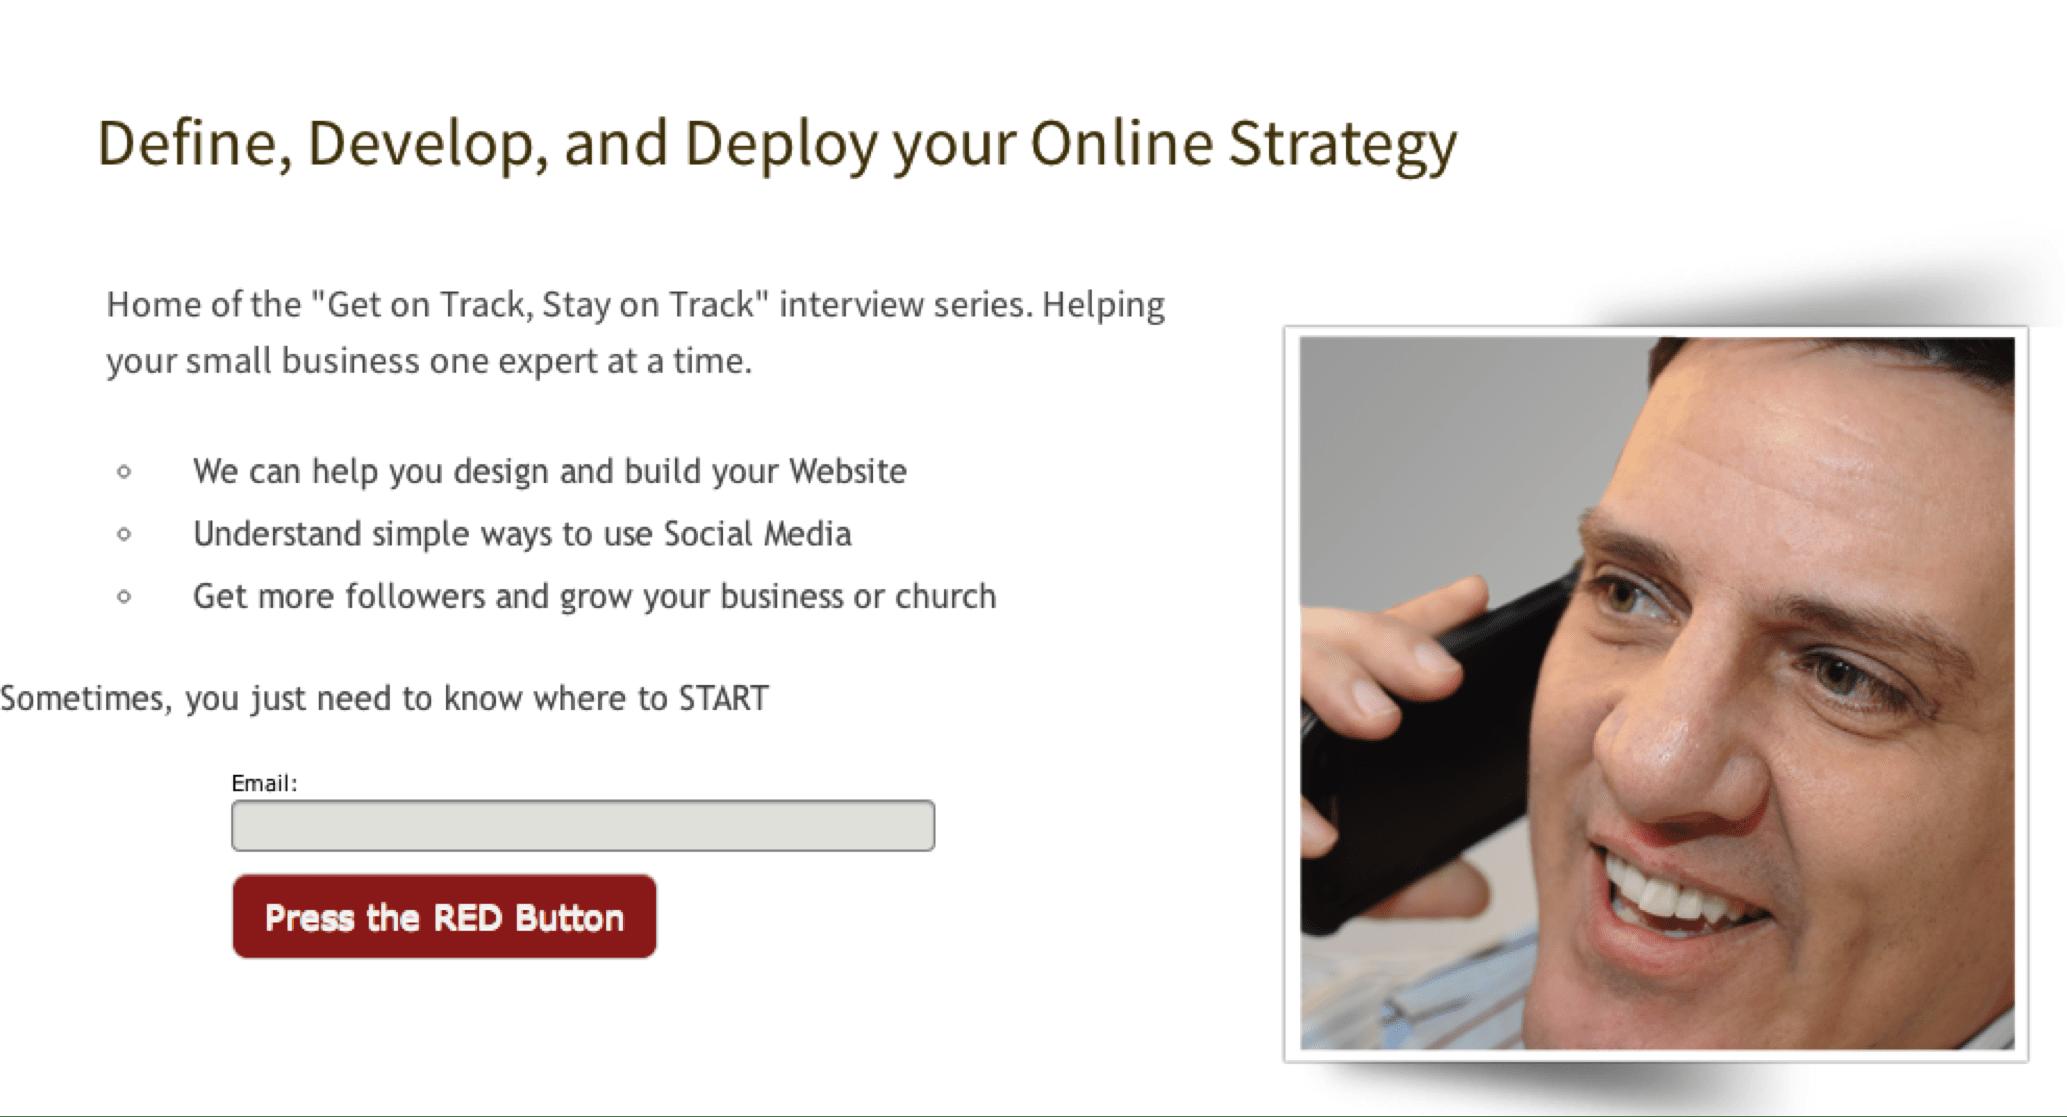 Social Media: big red button